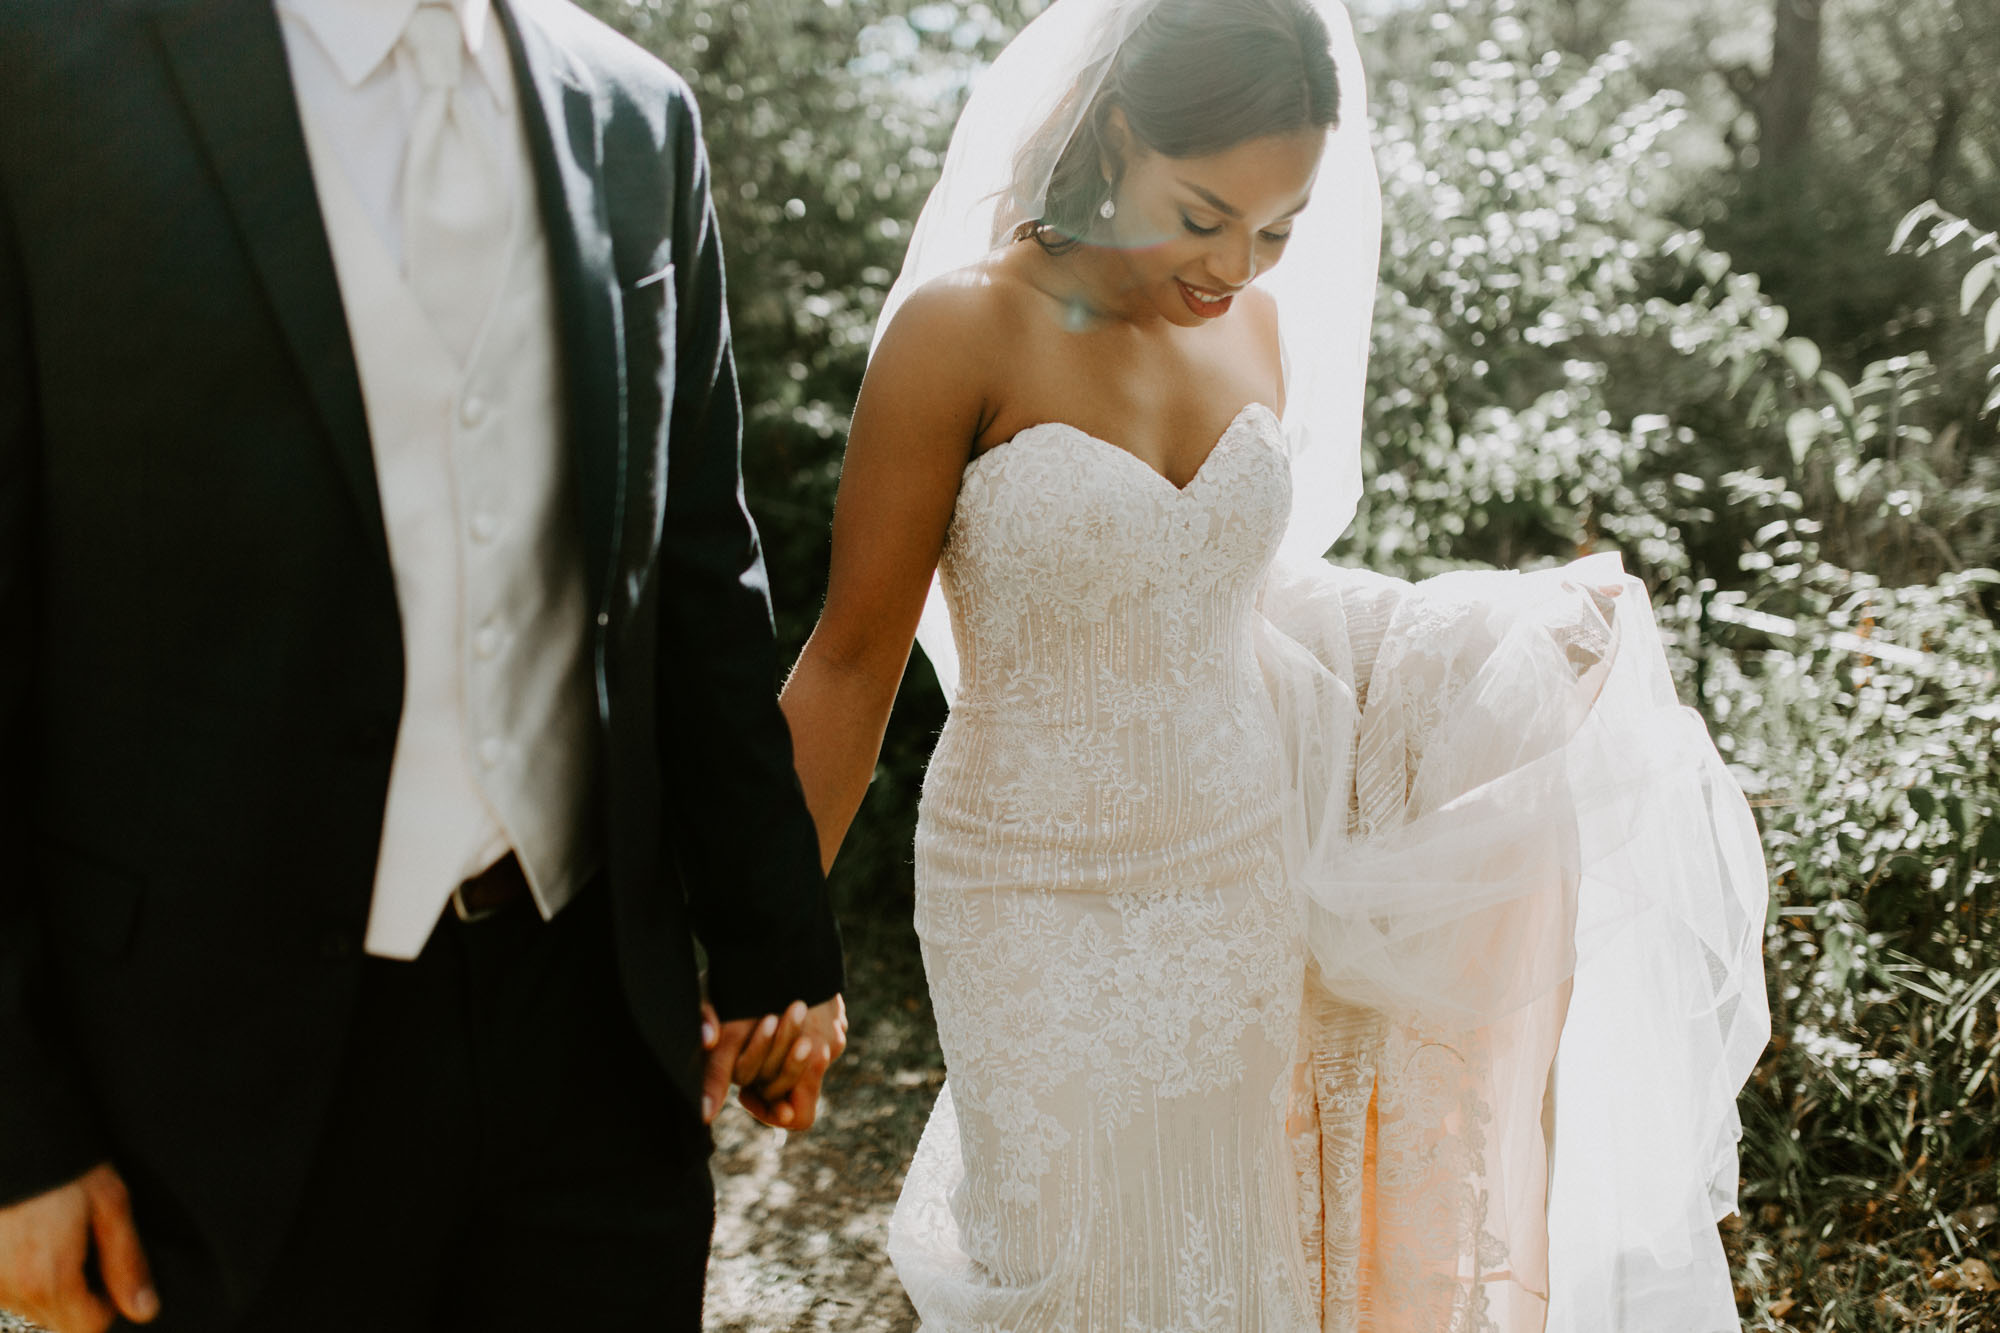 prairie_glass_house_wedding_champaign_wright_photographs_simon_0050.jpg